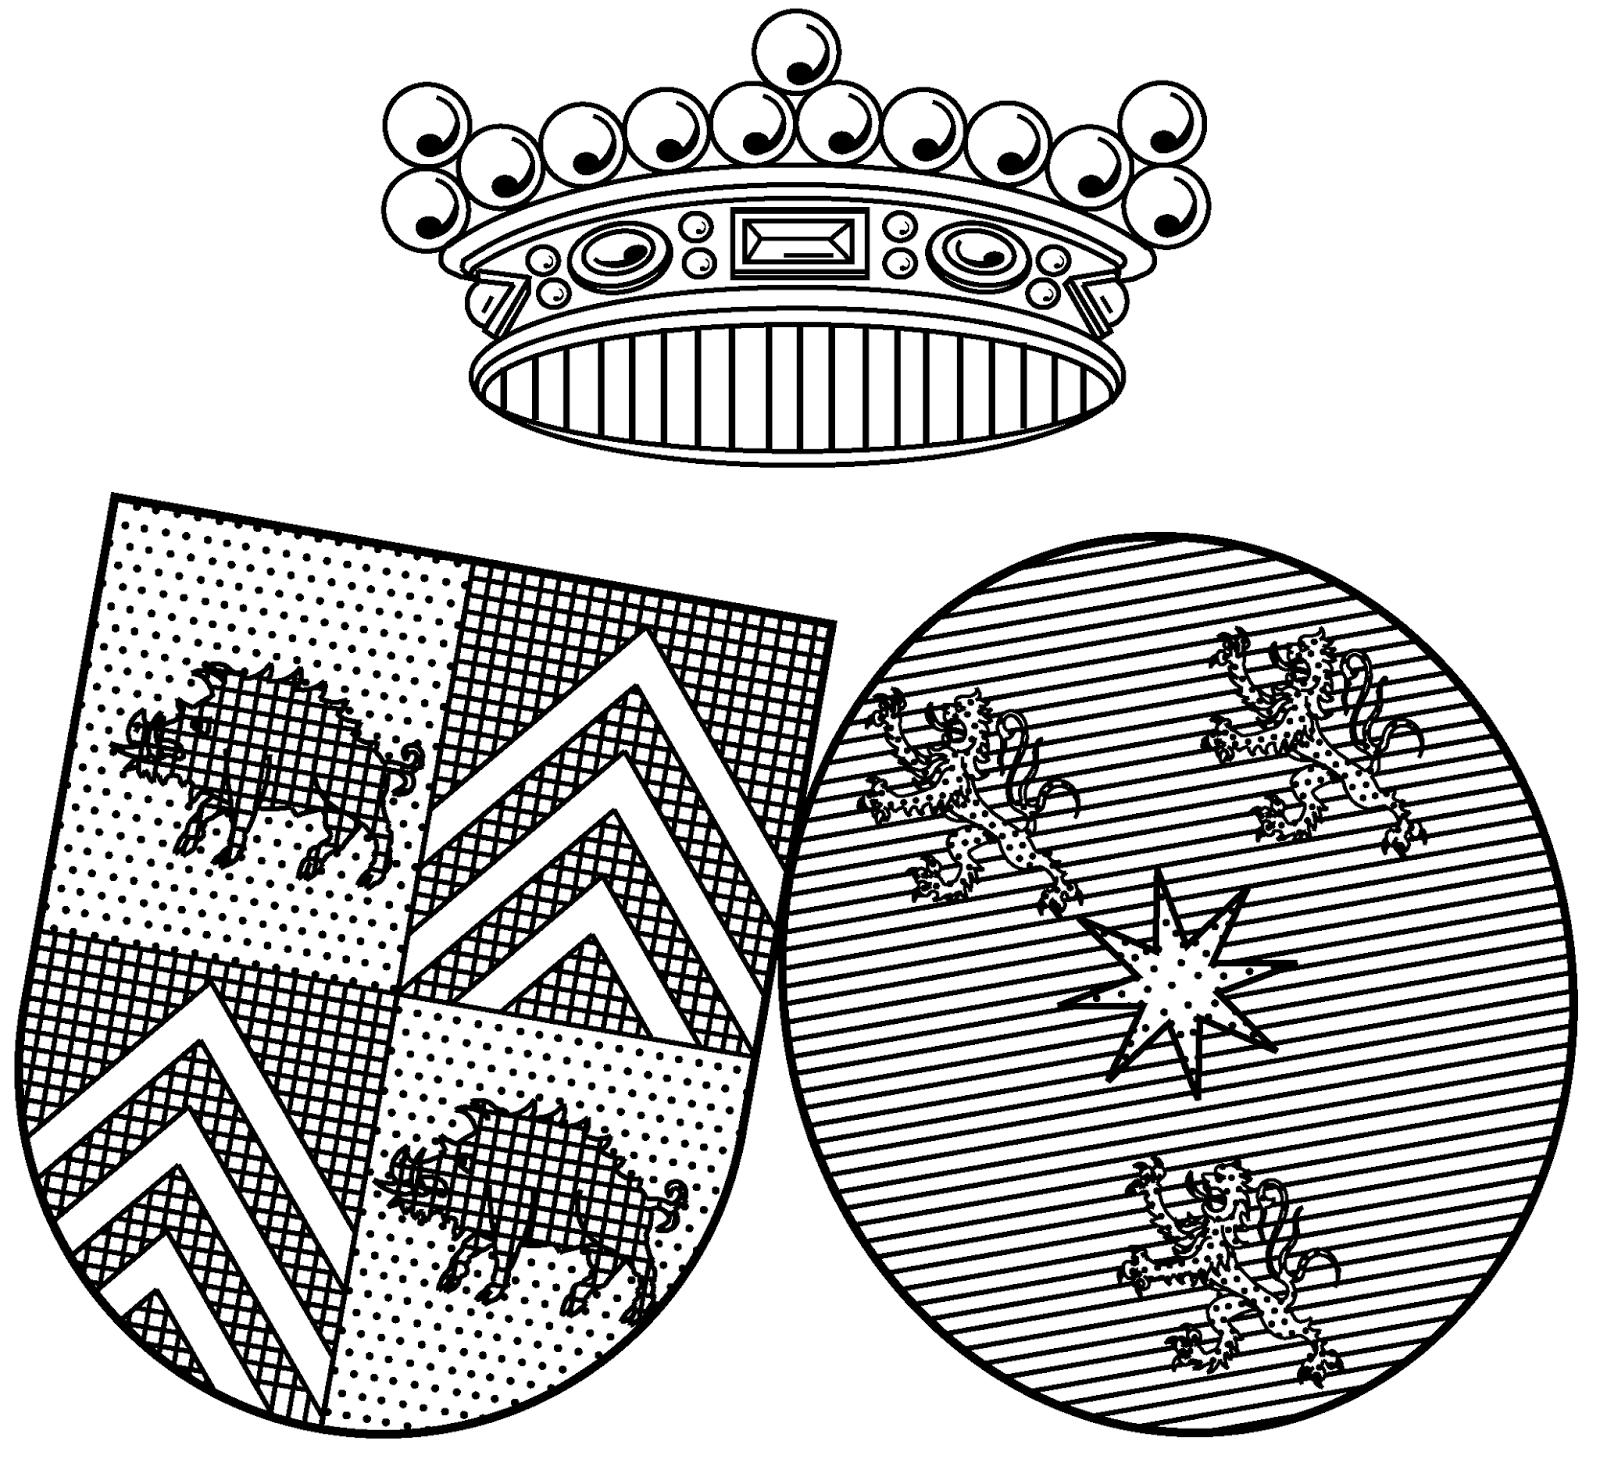 Ex-libris de la Famille van de Werve de Schilde.